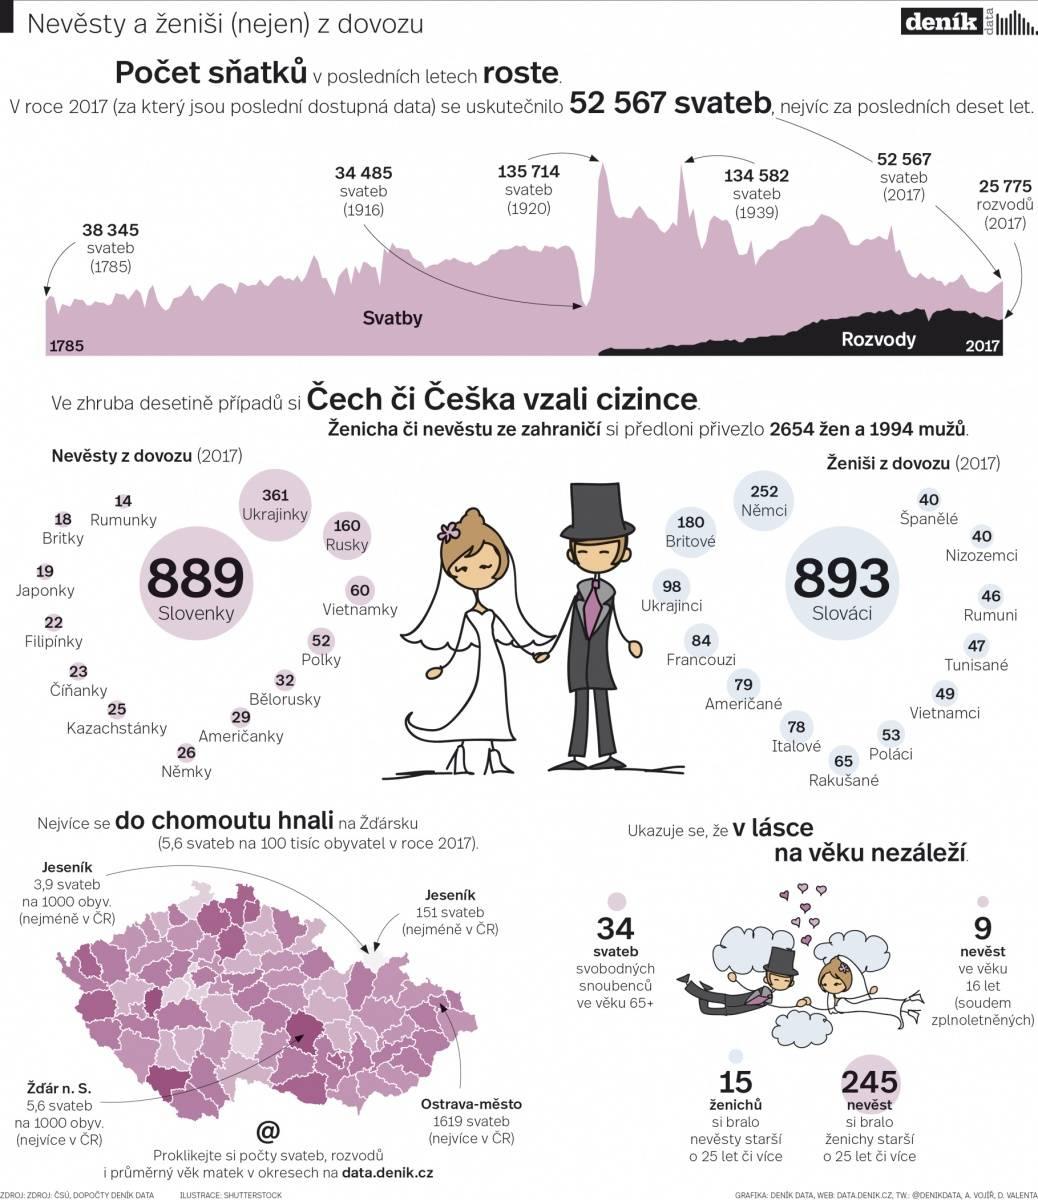 Заключение брака в словакии и вид на жительство